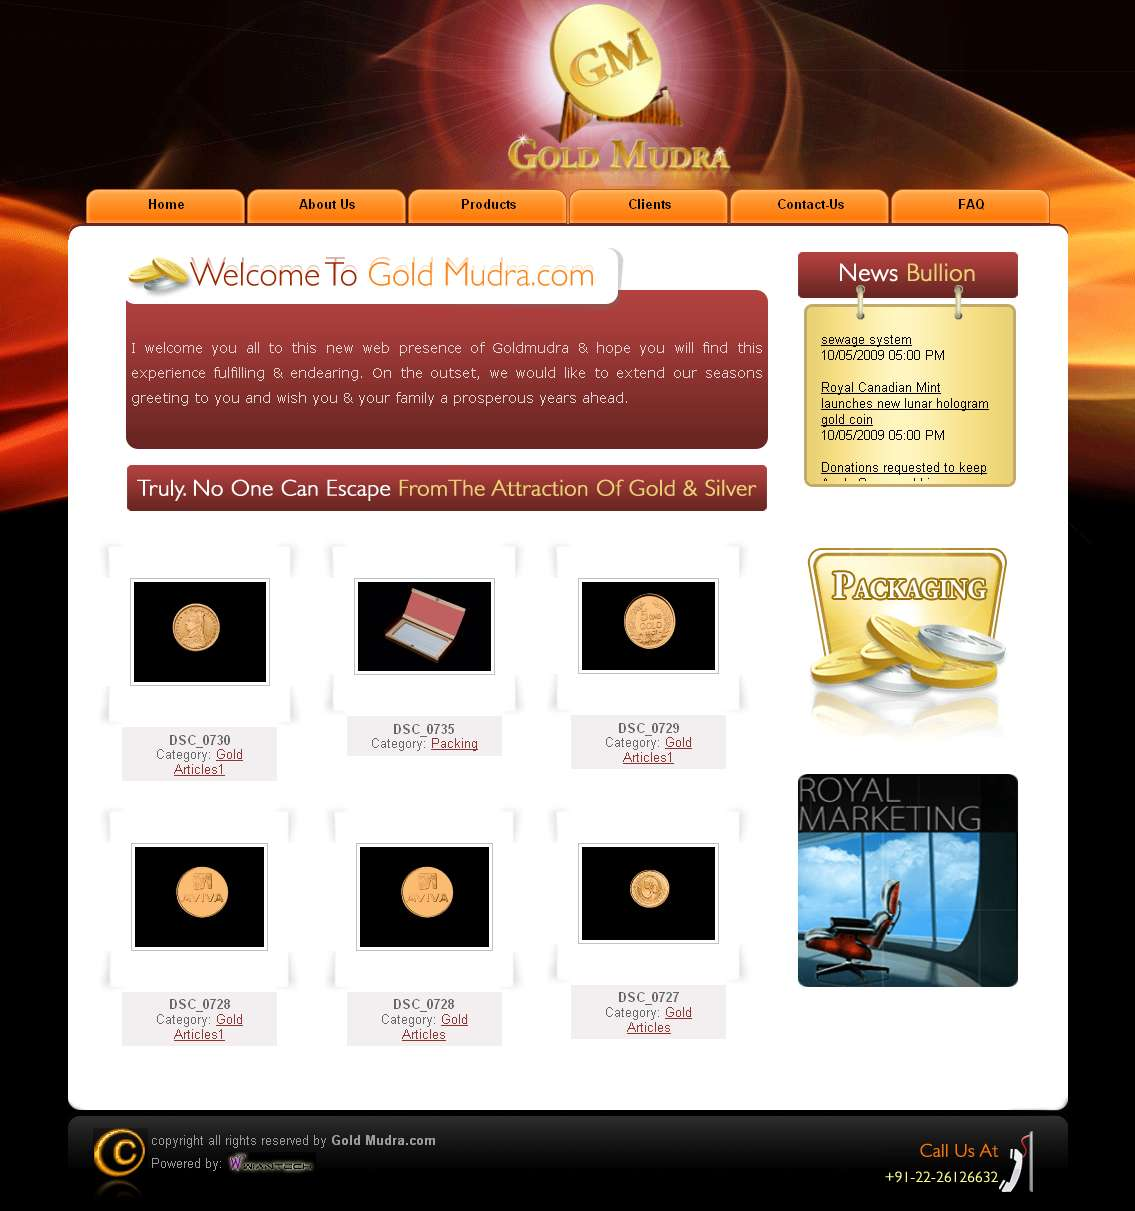 Gold Mudra